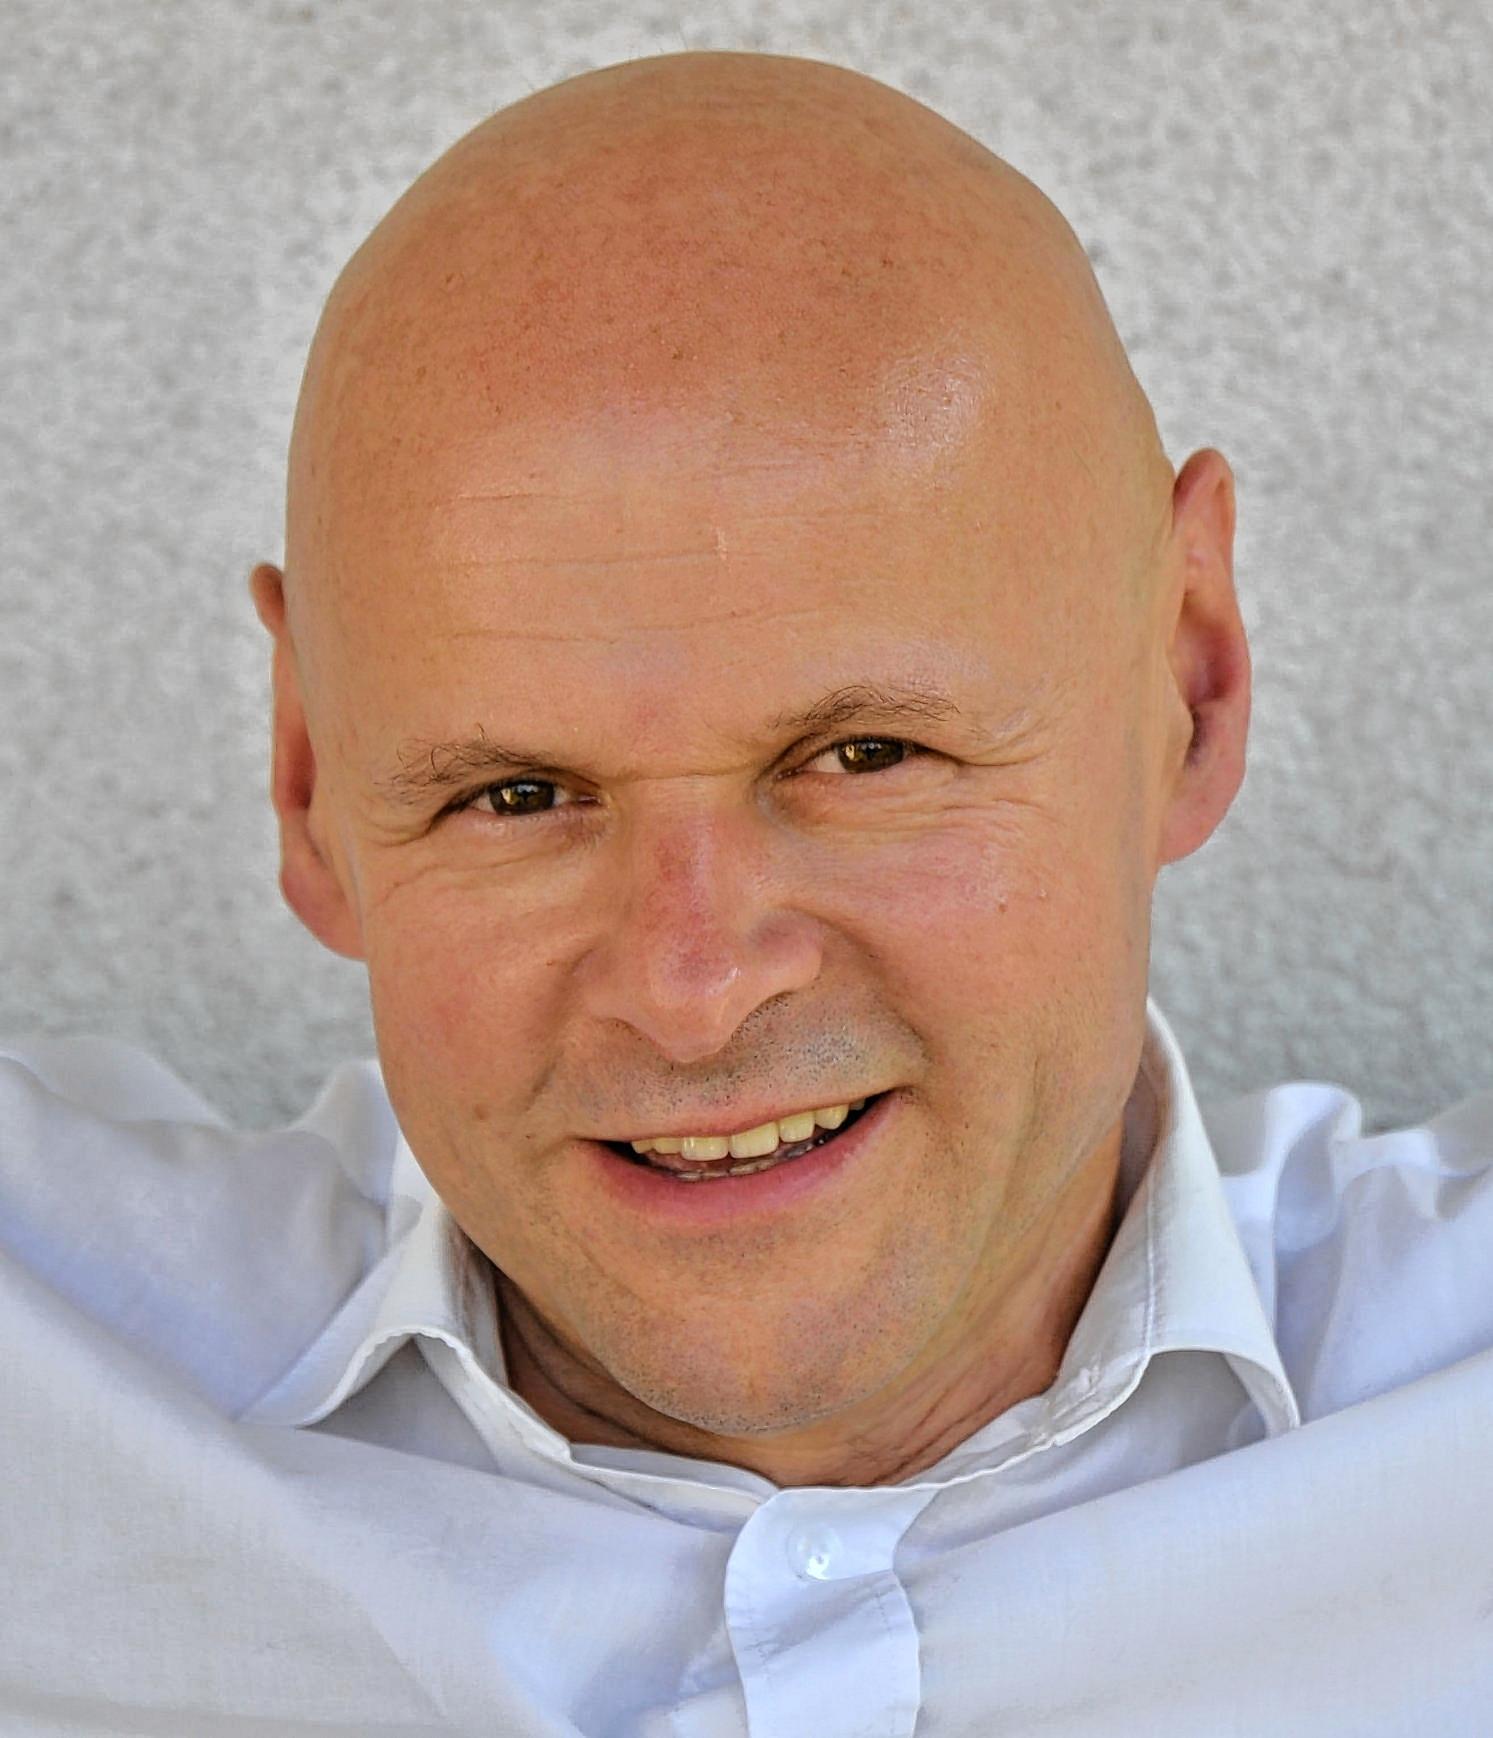 Kabarettist Jörg-<b>Martin Willnauer</b> gastiert am Samstag, 21. - image